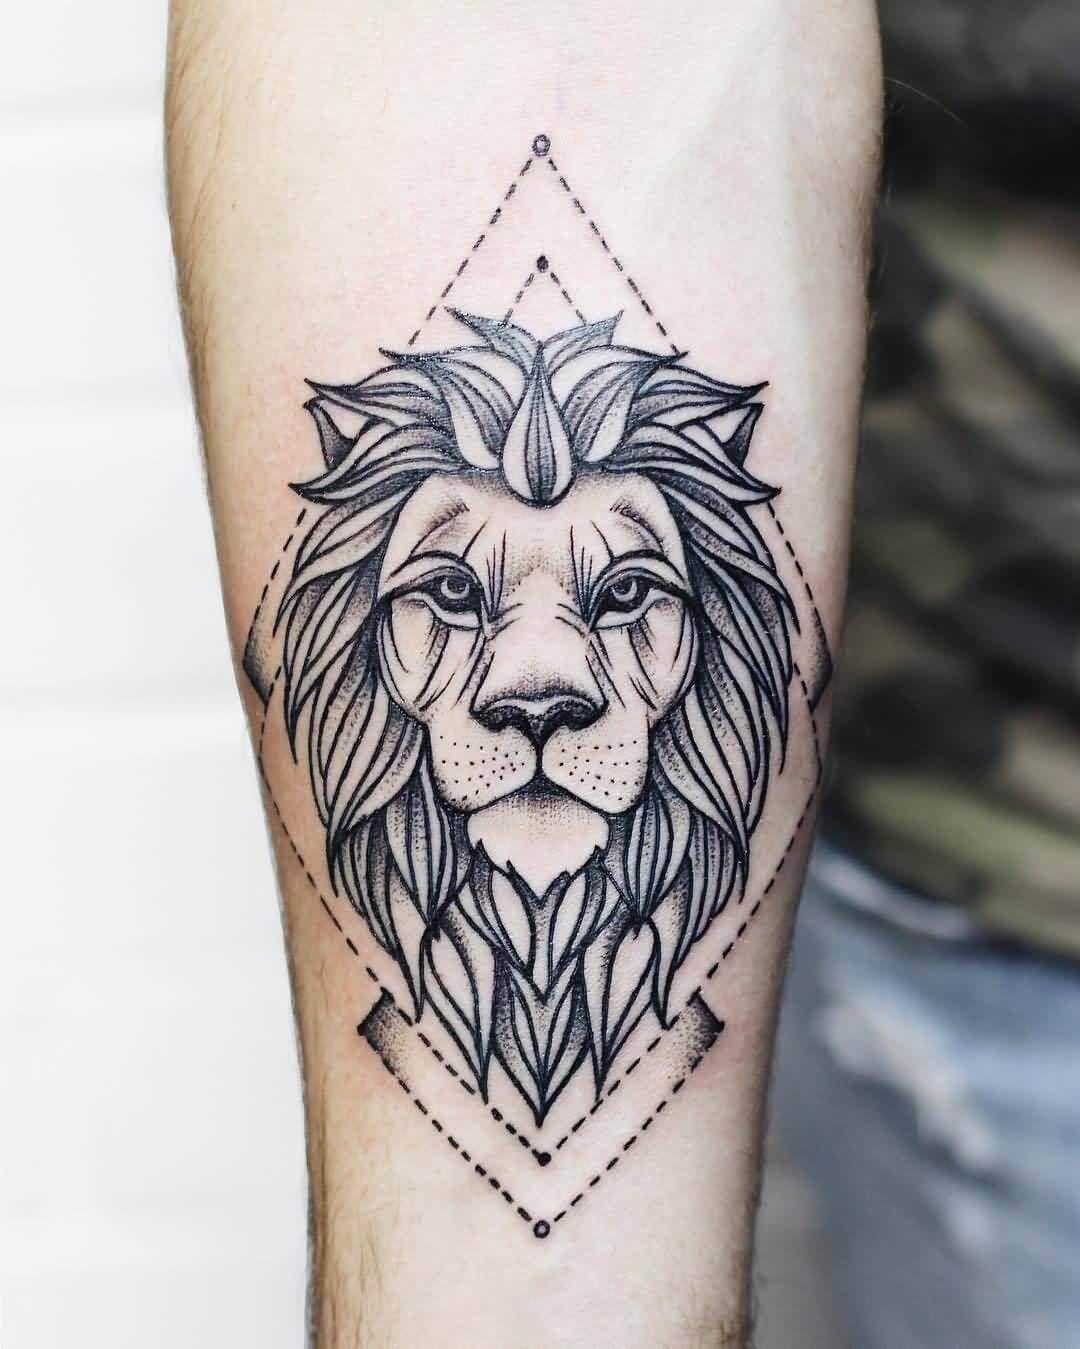 Top 21 Geometric Lion Tattoo Designs In 2020 Geometric Tattoo Geometric Lion Tattoo Lion Tattoo Design